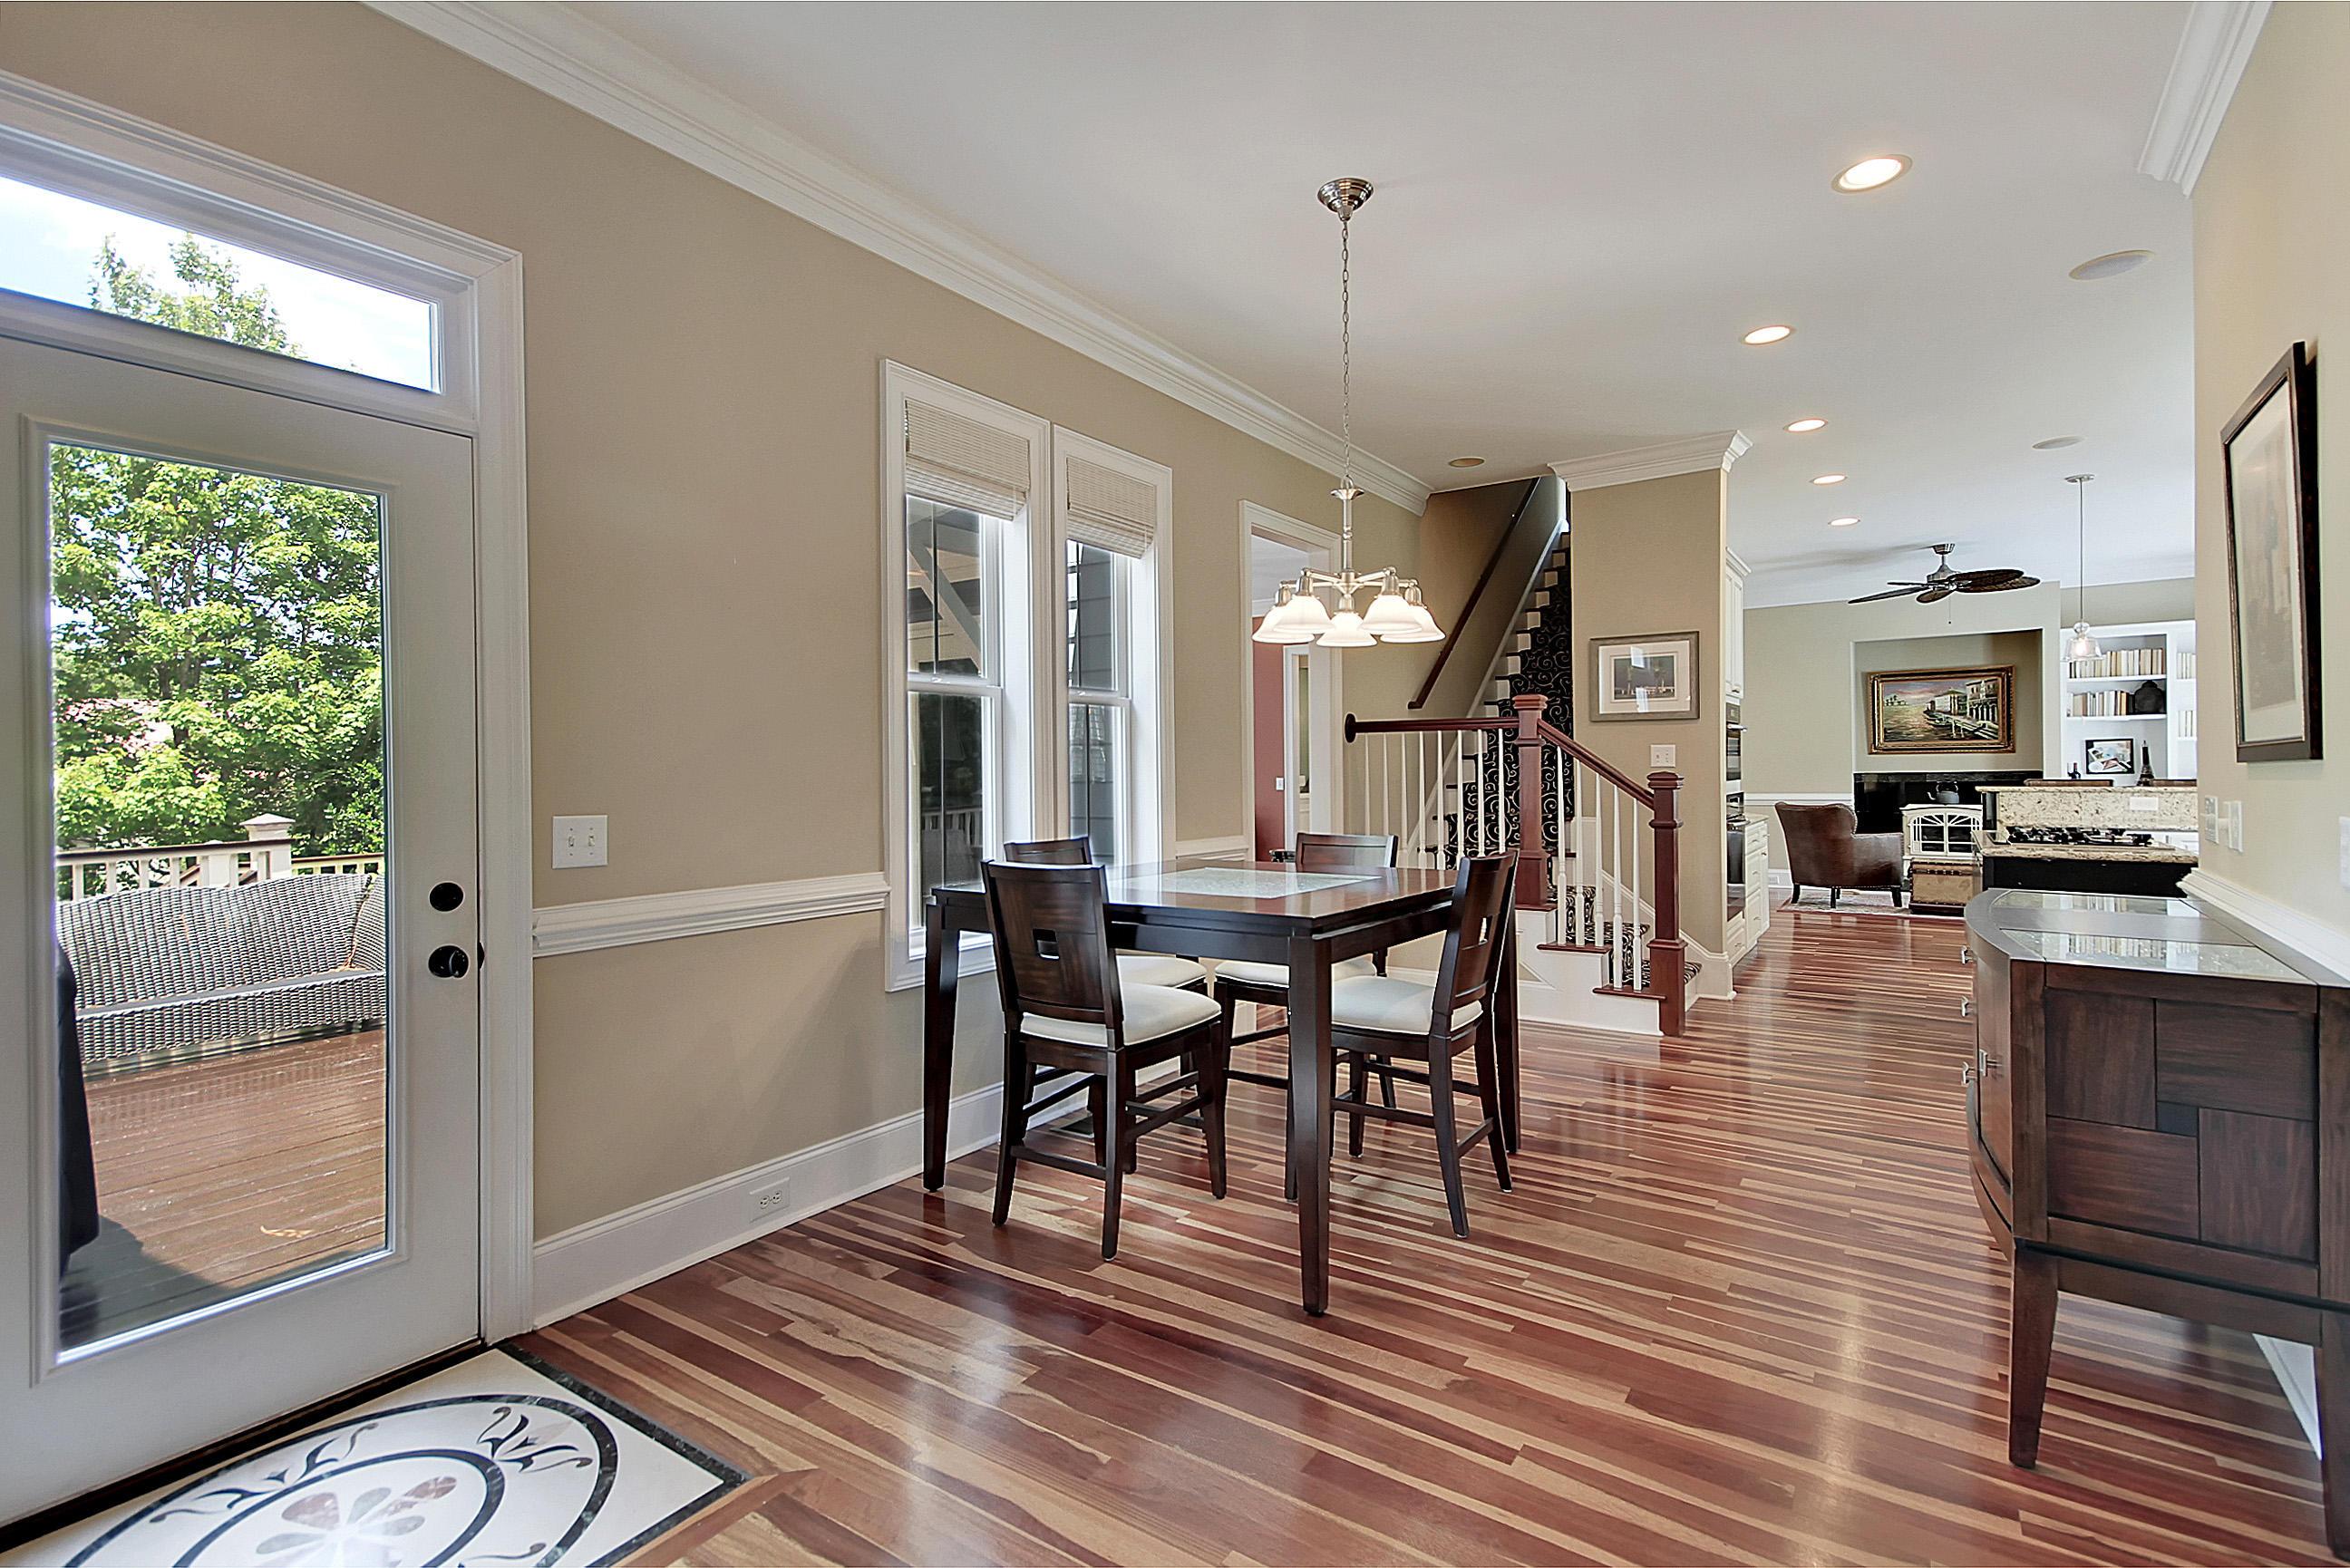 Belle Hall Homes For Sale - 368 Evian, Mount Pleasant, SC - 4